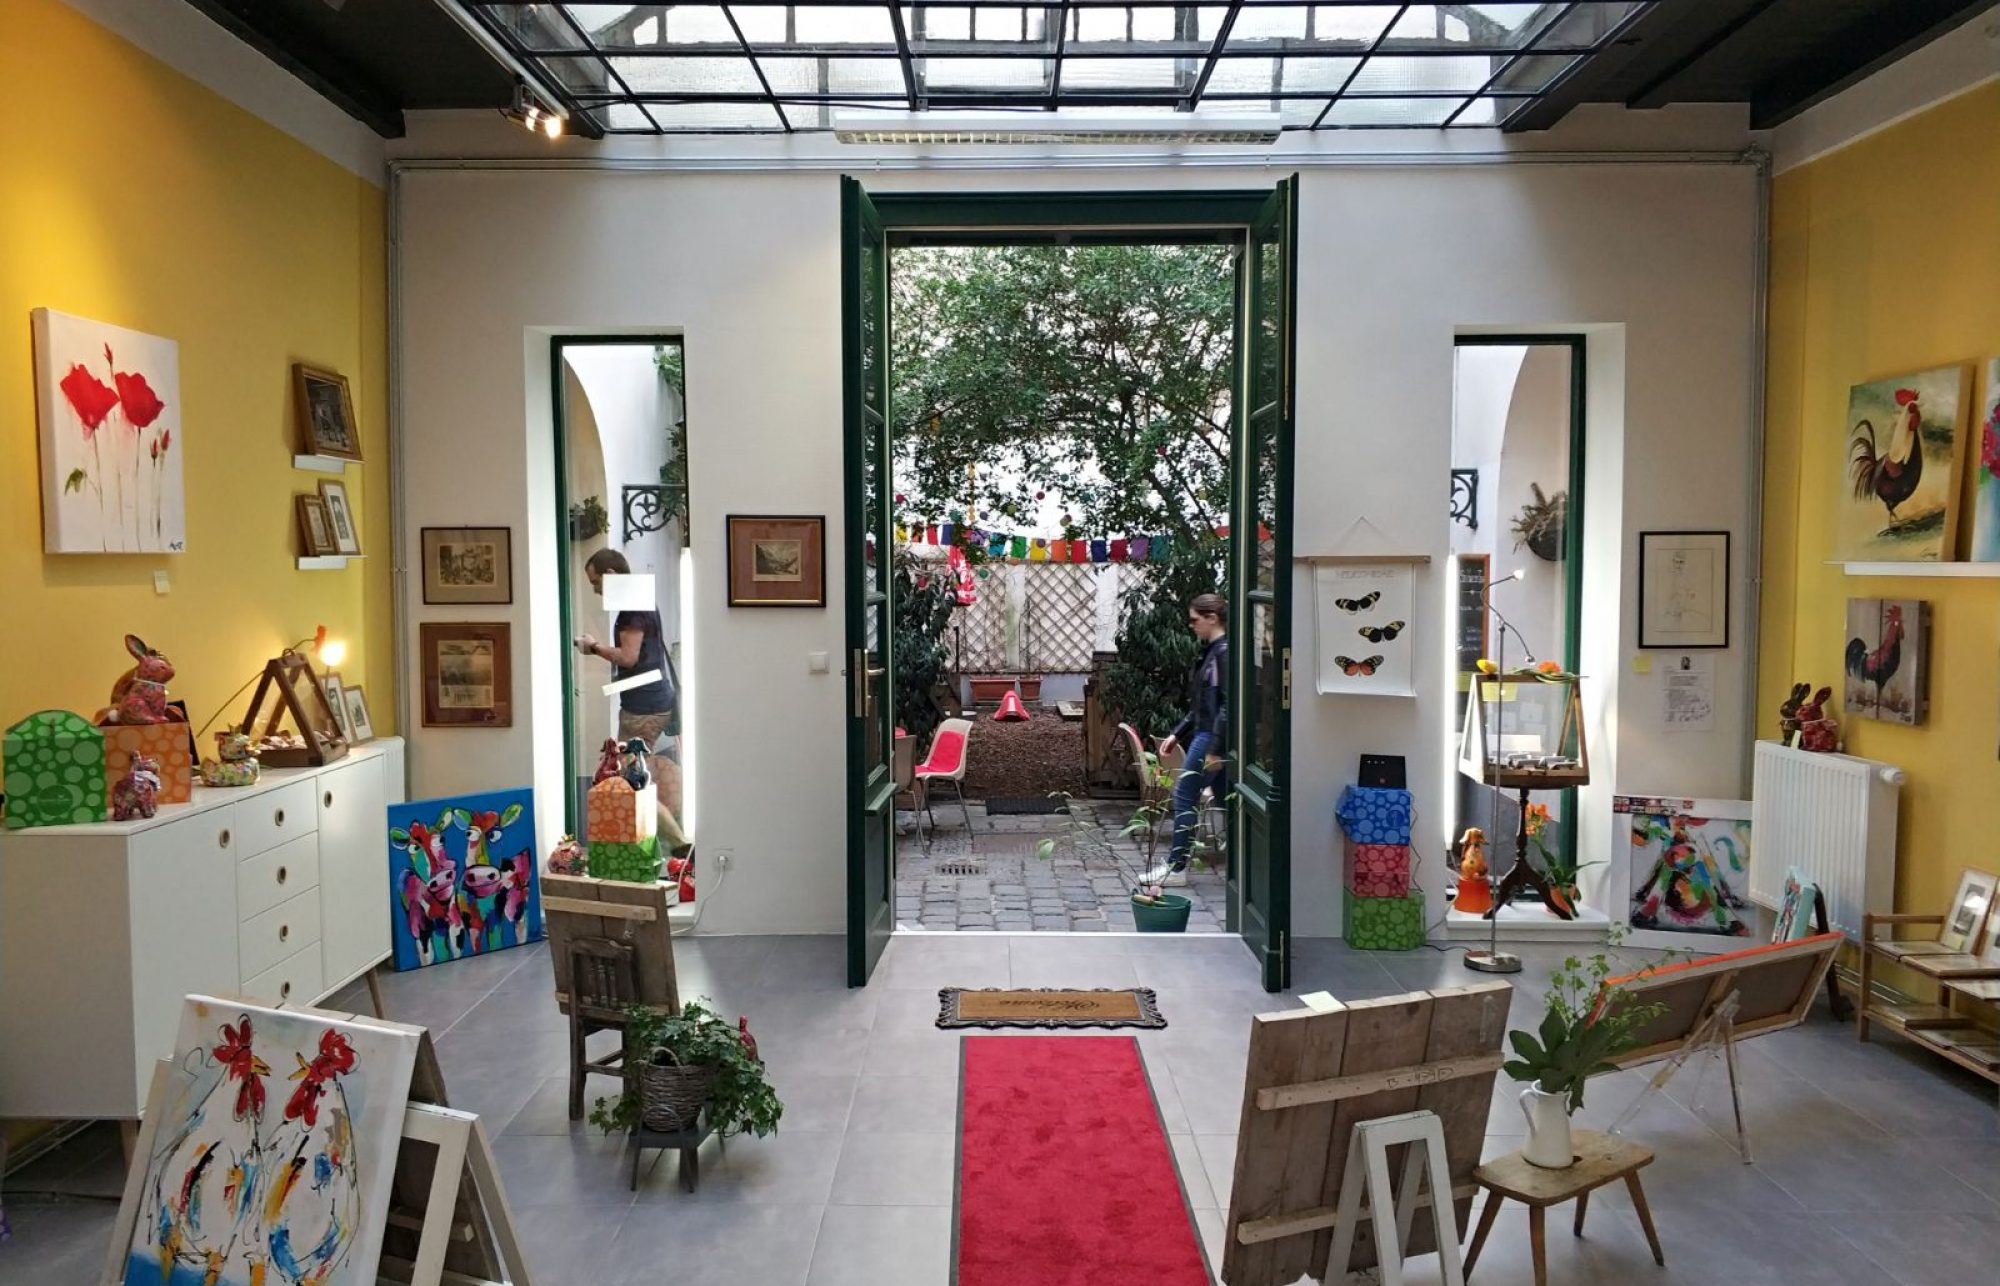 Galerie Farbenspiel